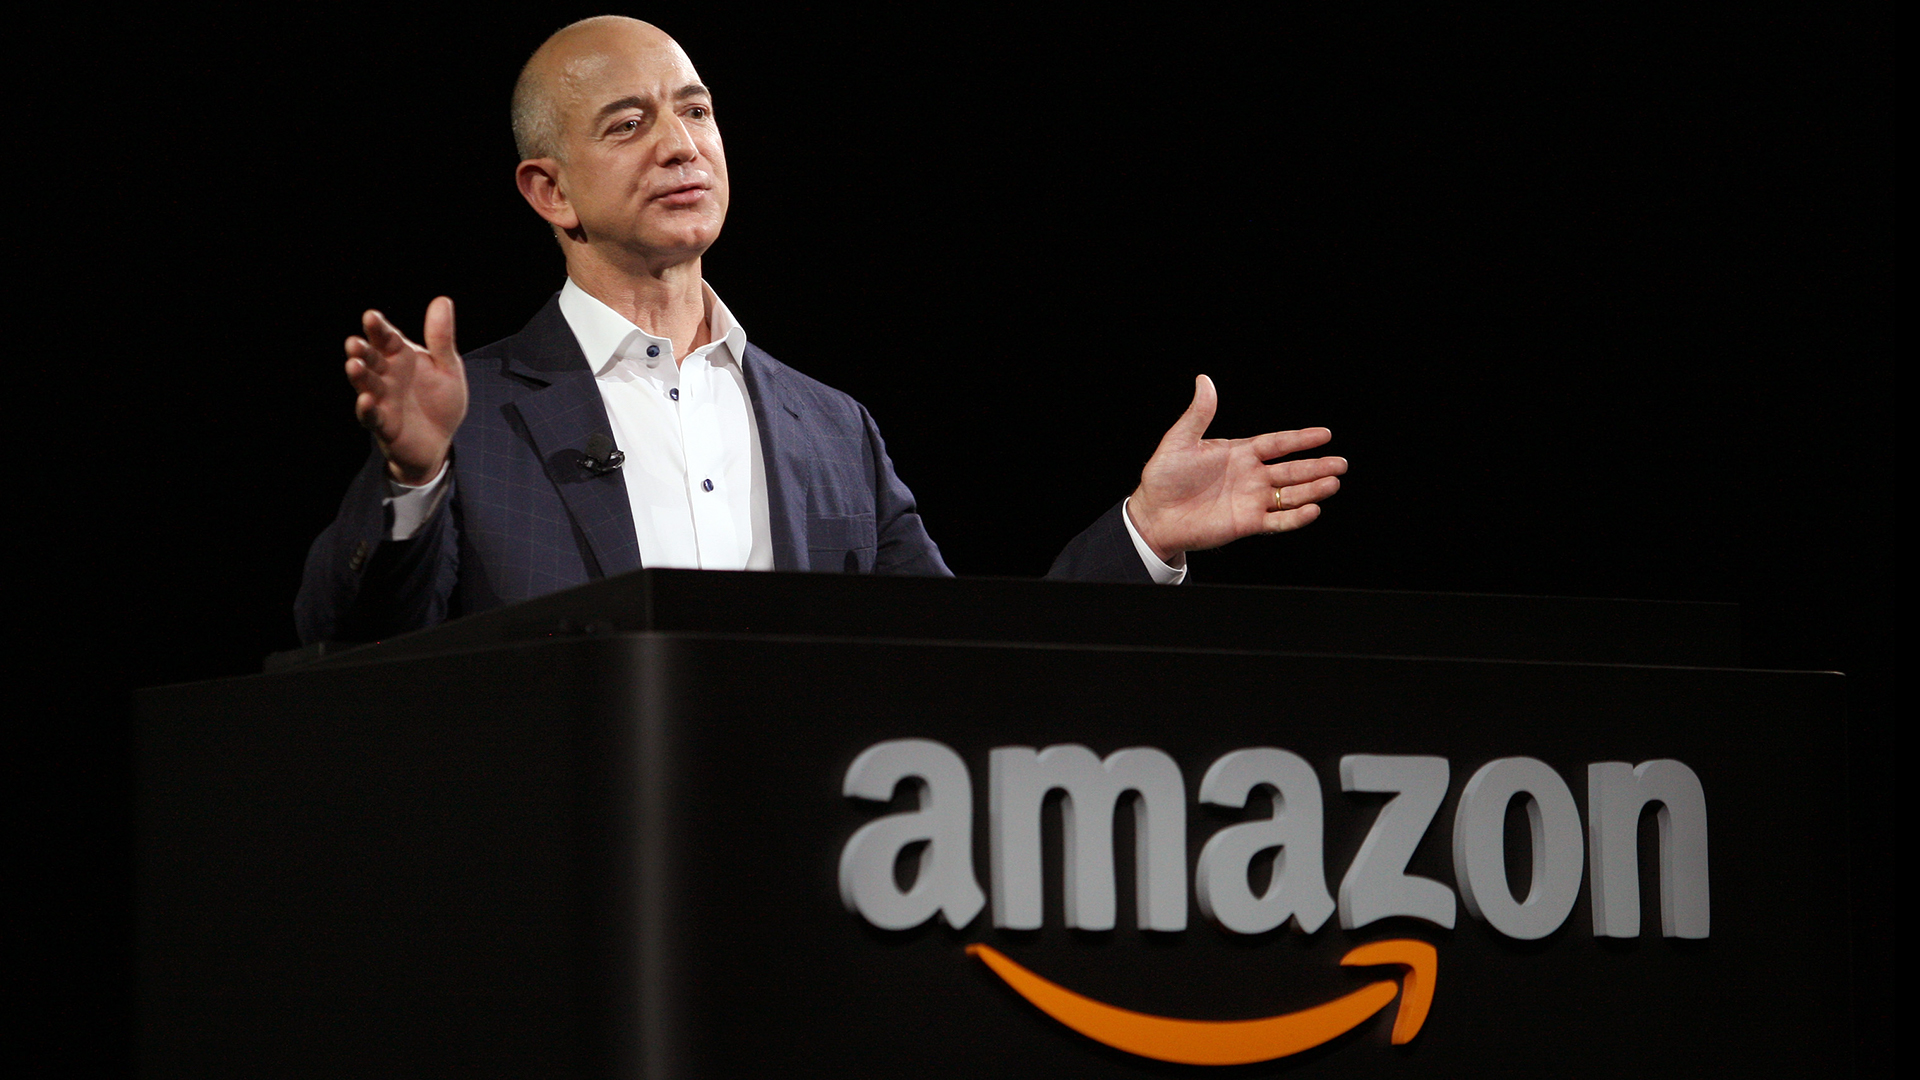 Jeff Bezos CEO Amazon-159532.jpg64191372